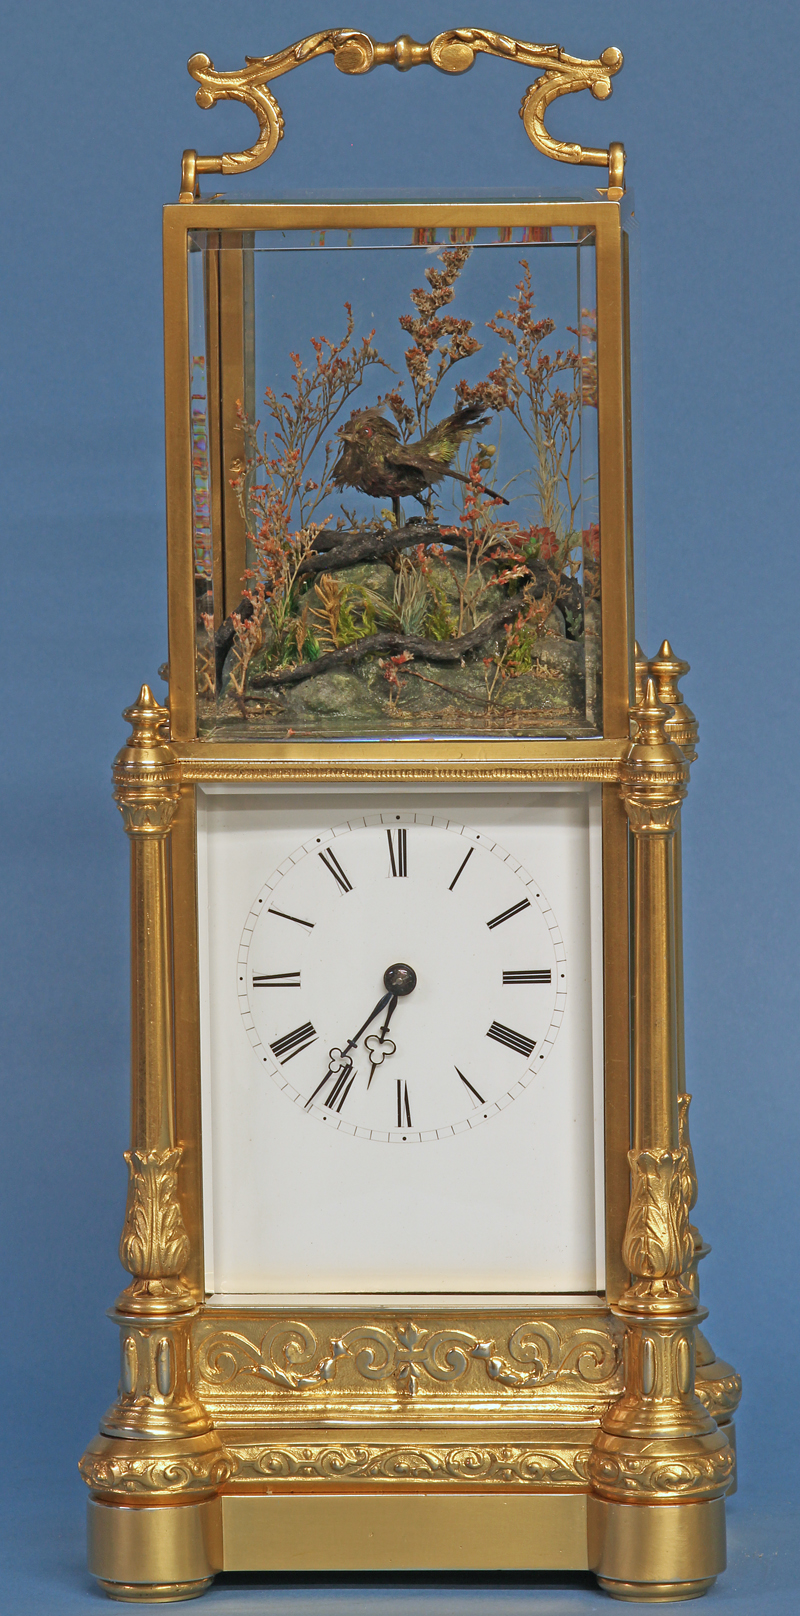 Automated Singing Bird Carriage Clock